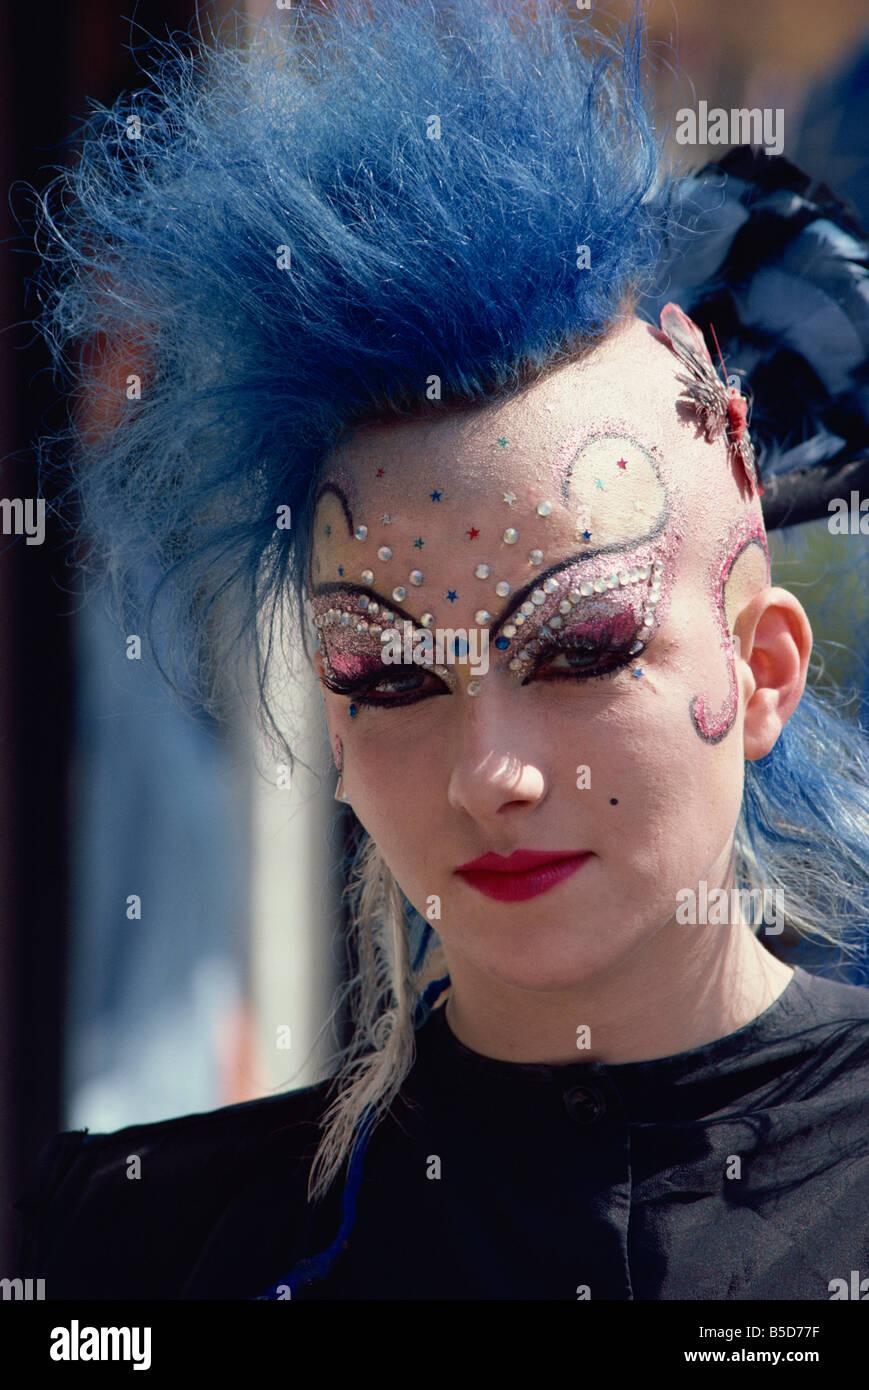 Portrait of a punk, Kensington, London, England, Europe - Stock Image